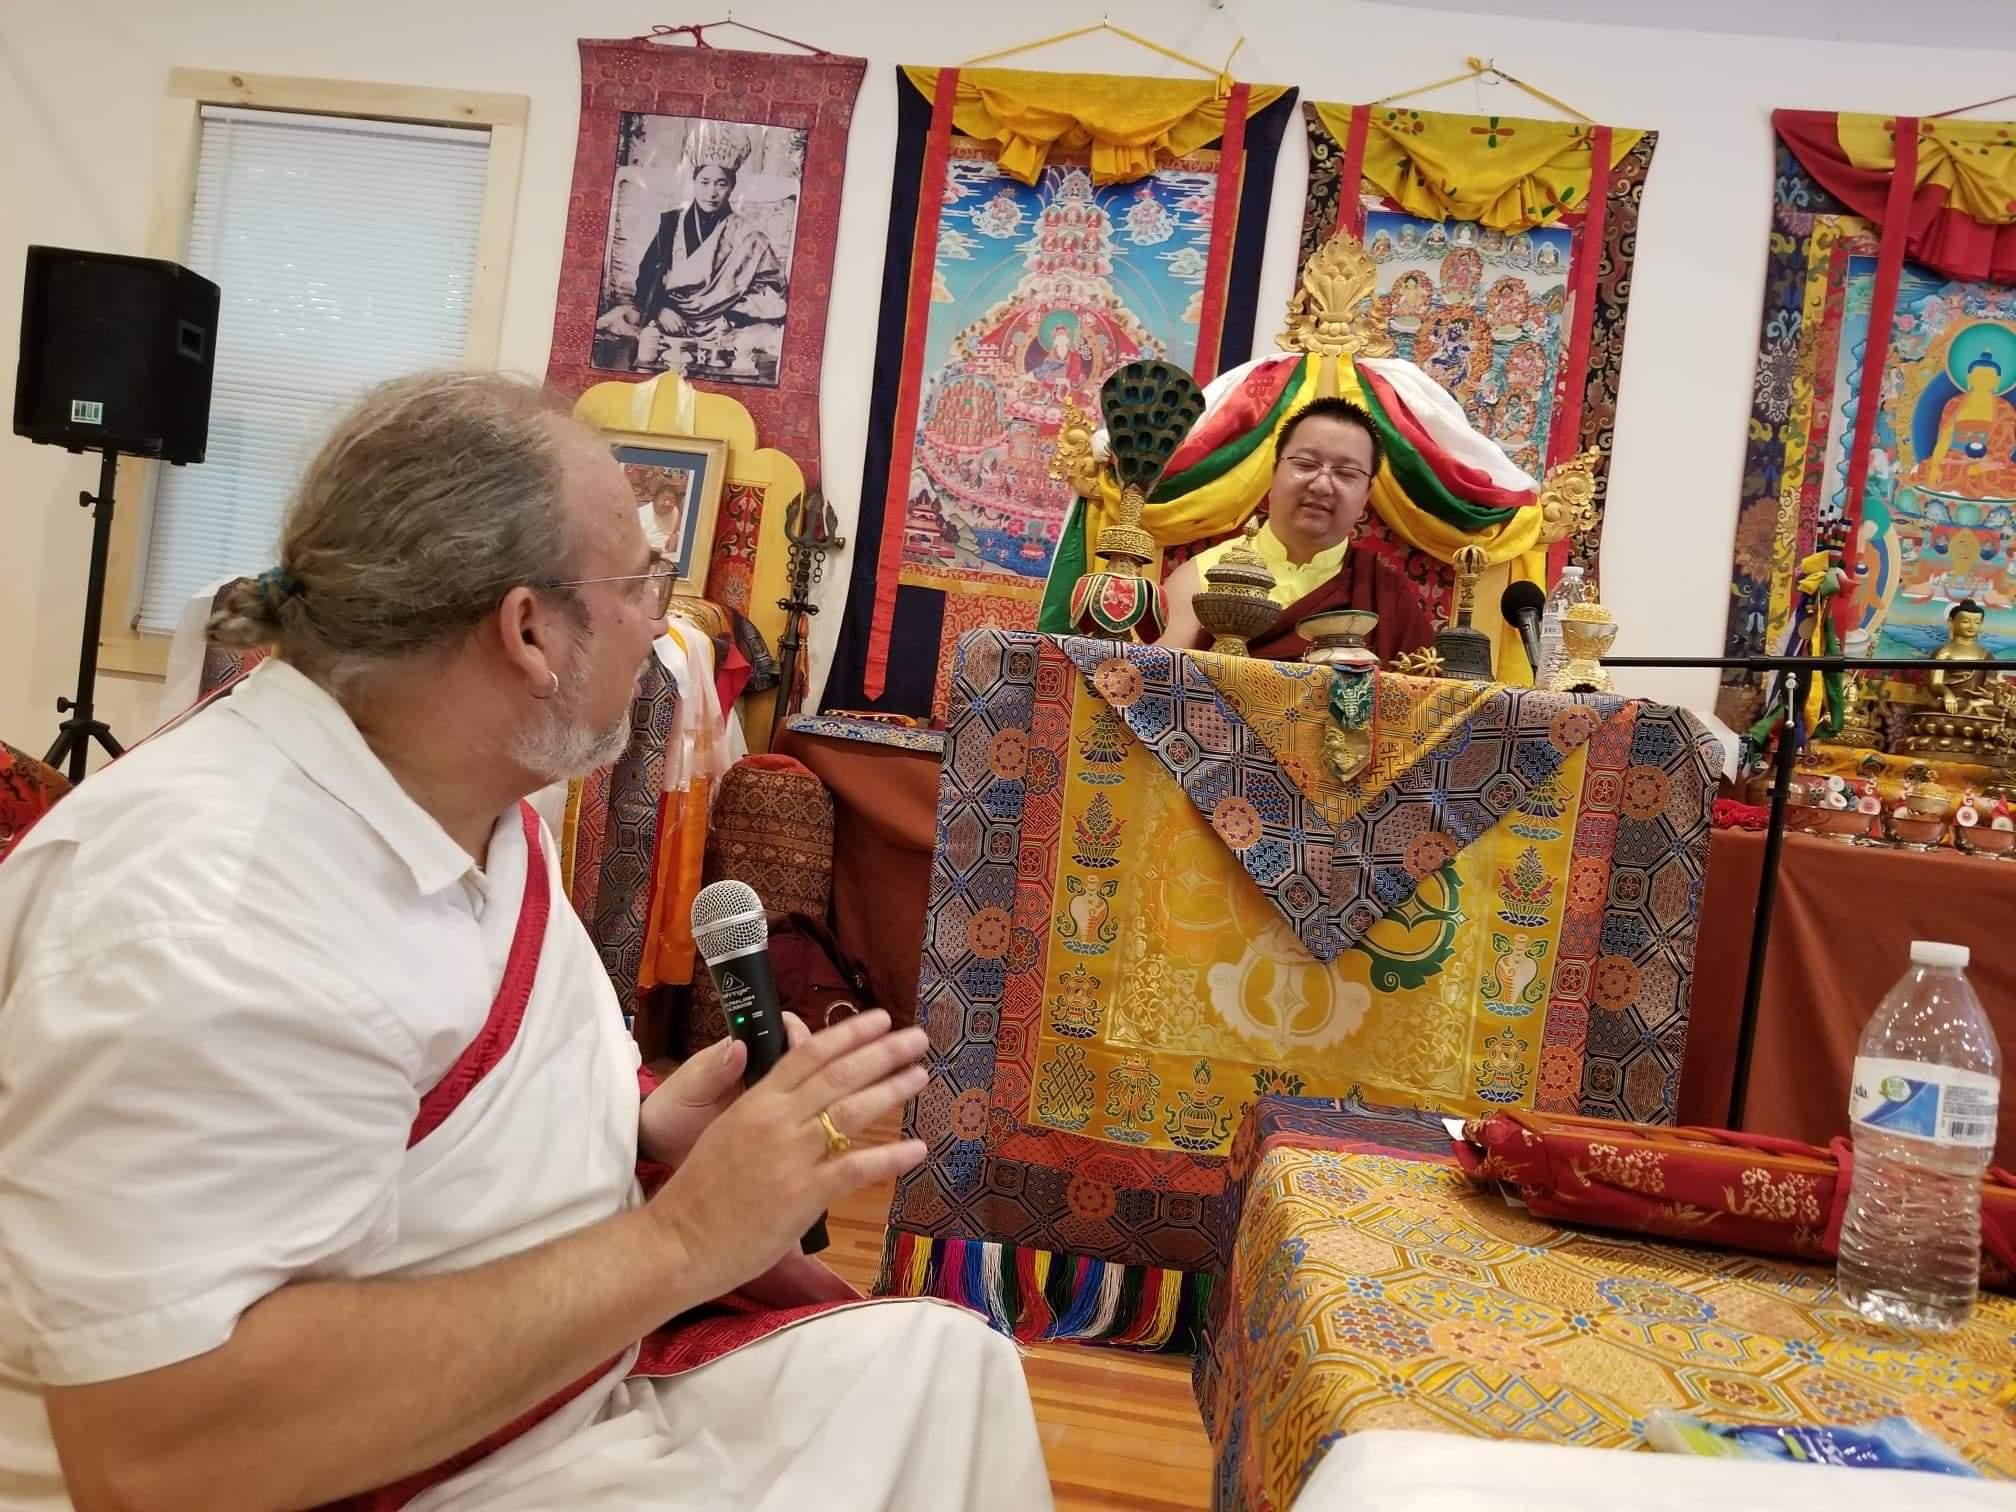 HH Yangsi Dudjom Pema Shepa Rinpoche in the new Shrine room